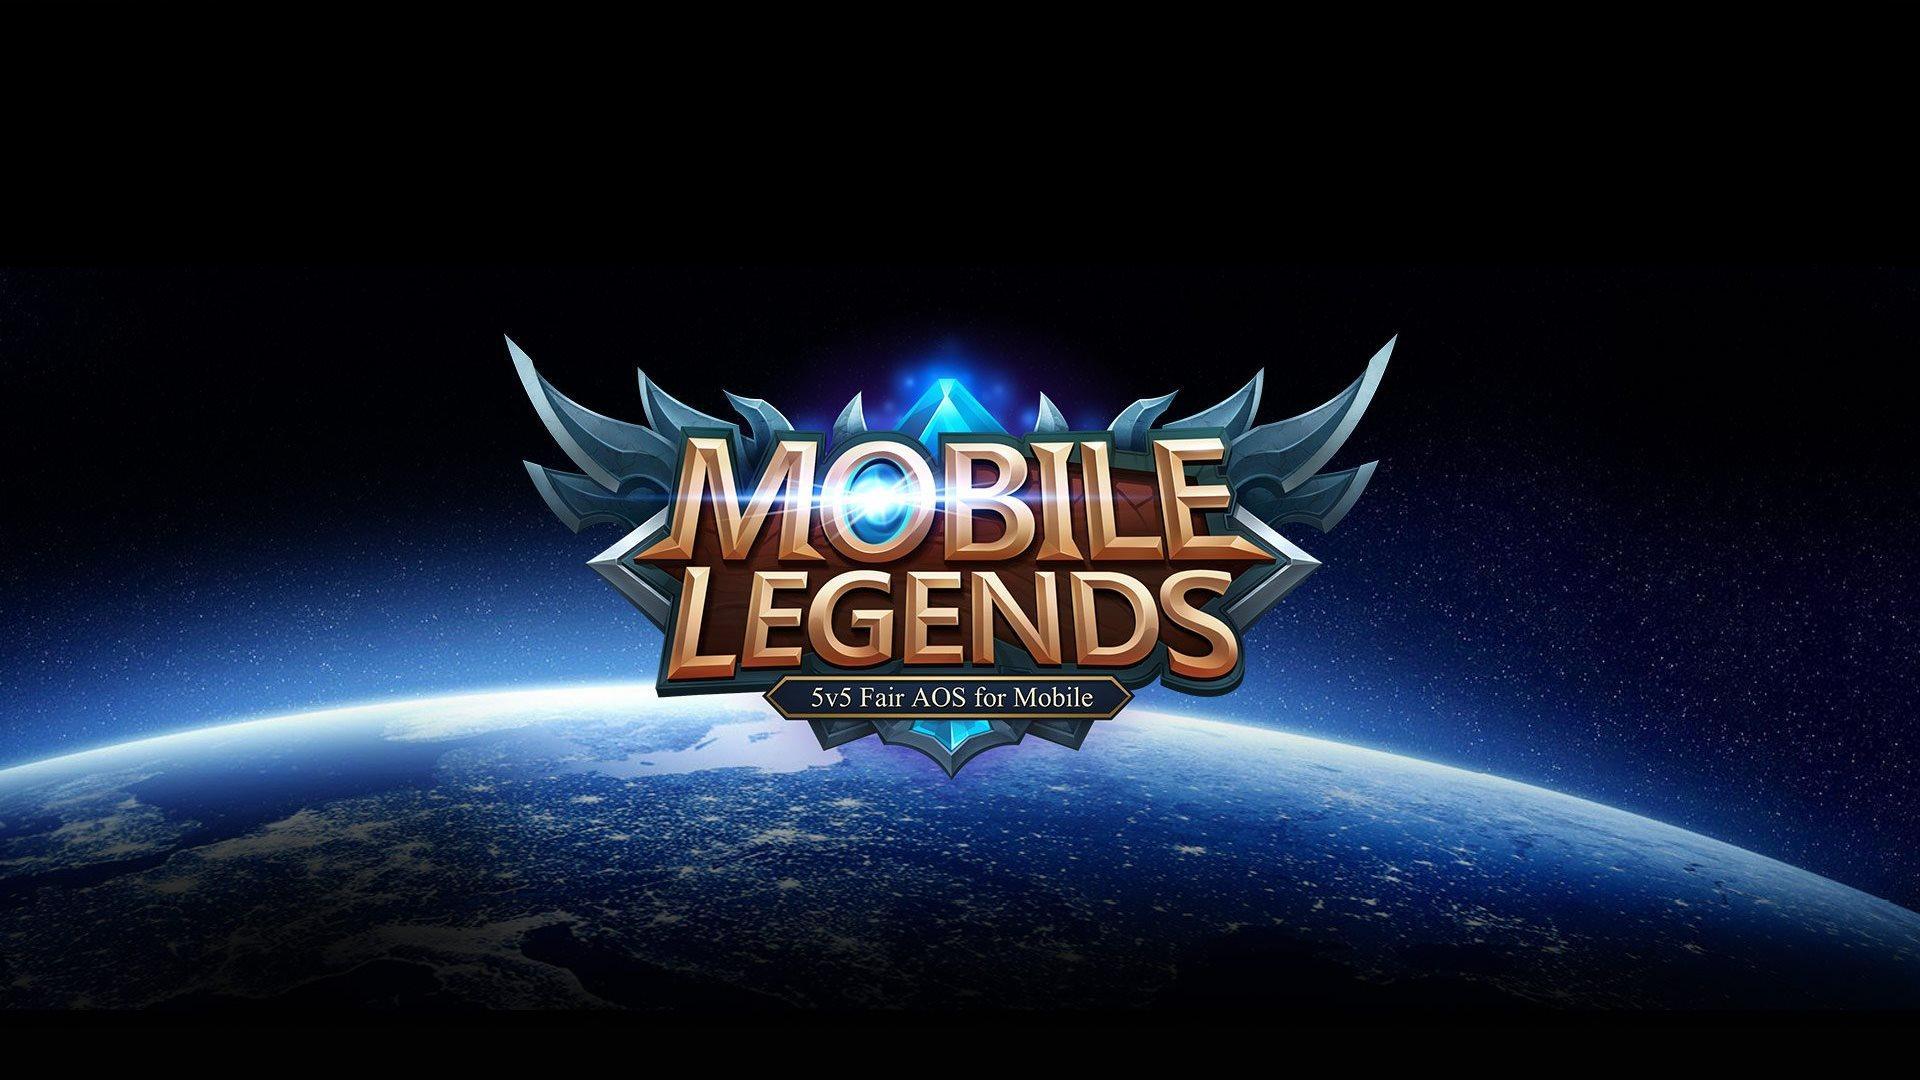 Mobile Legend Logo 4k Hd Wallpapers Wallpaper Cave